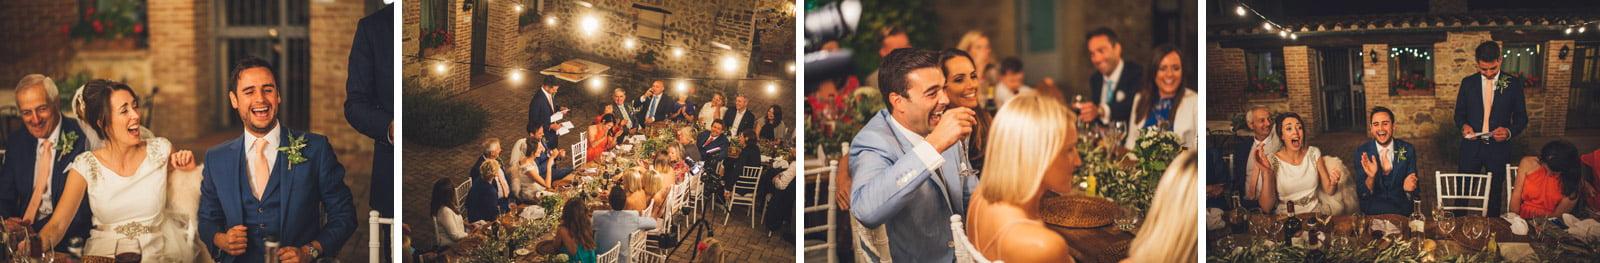 096-wedding-tuscany-san-galgano-federico-pannacci-photographer